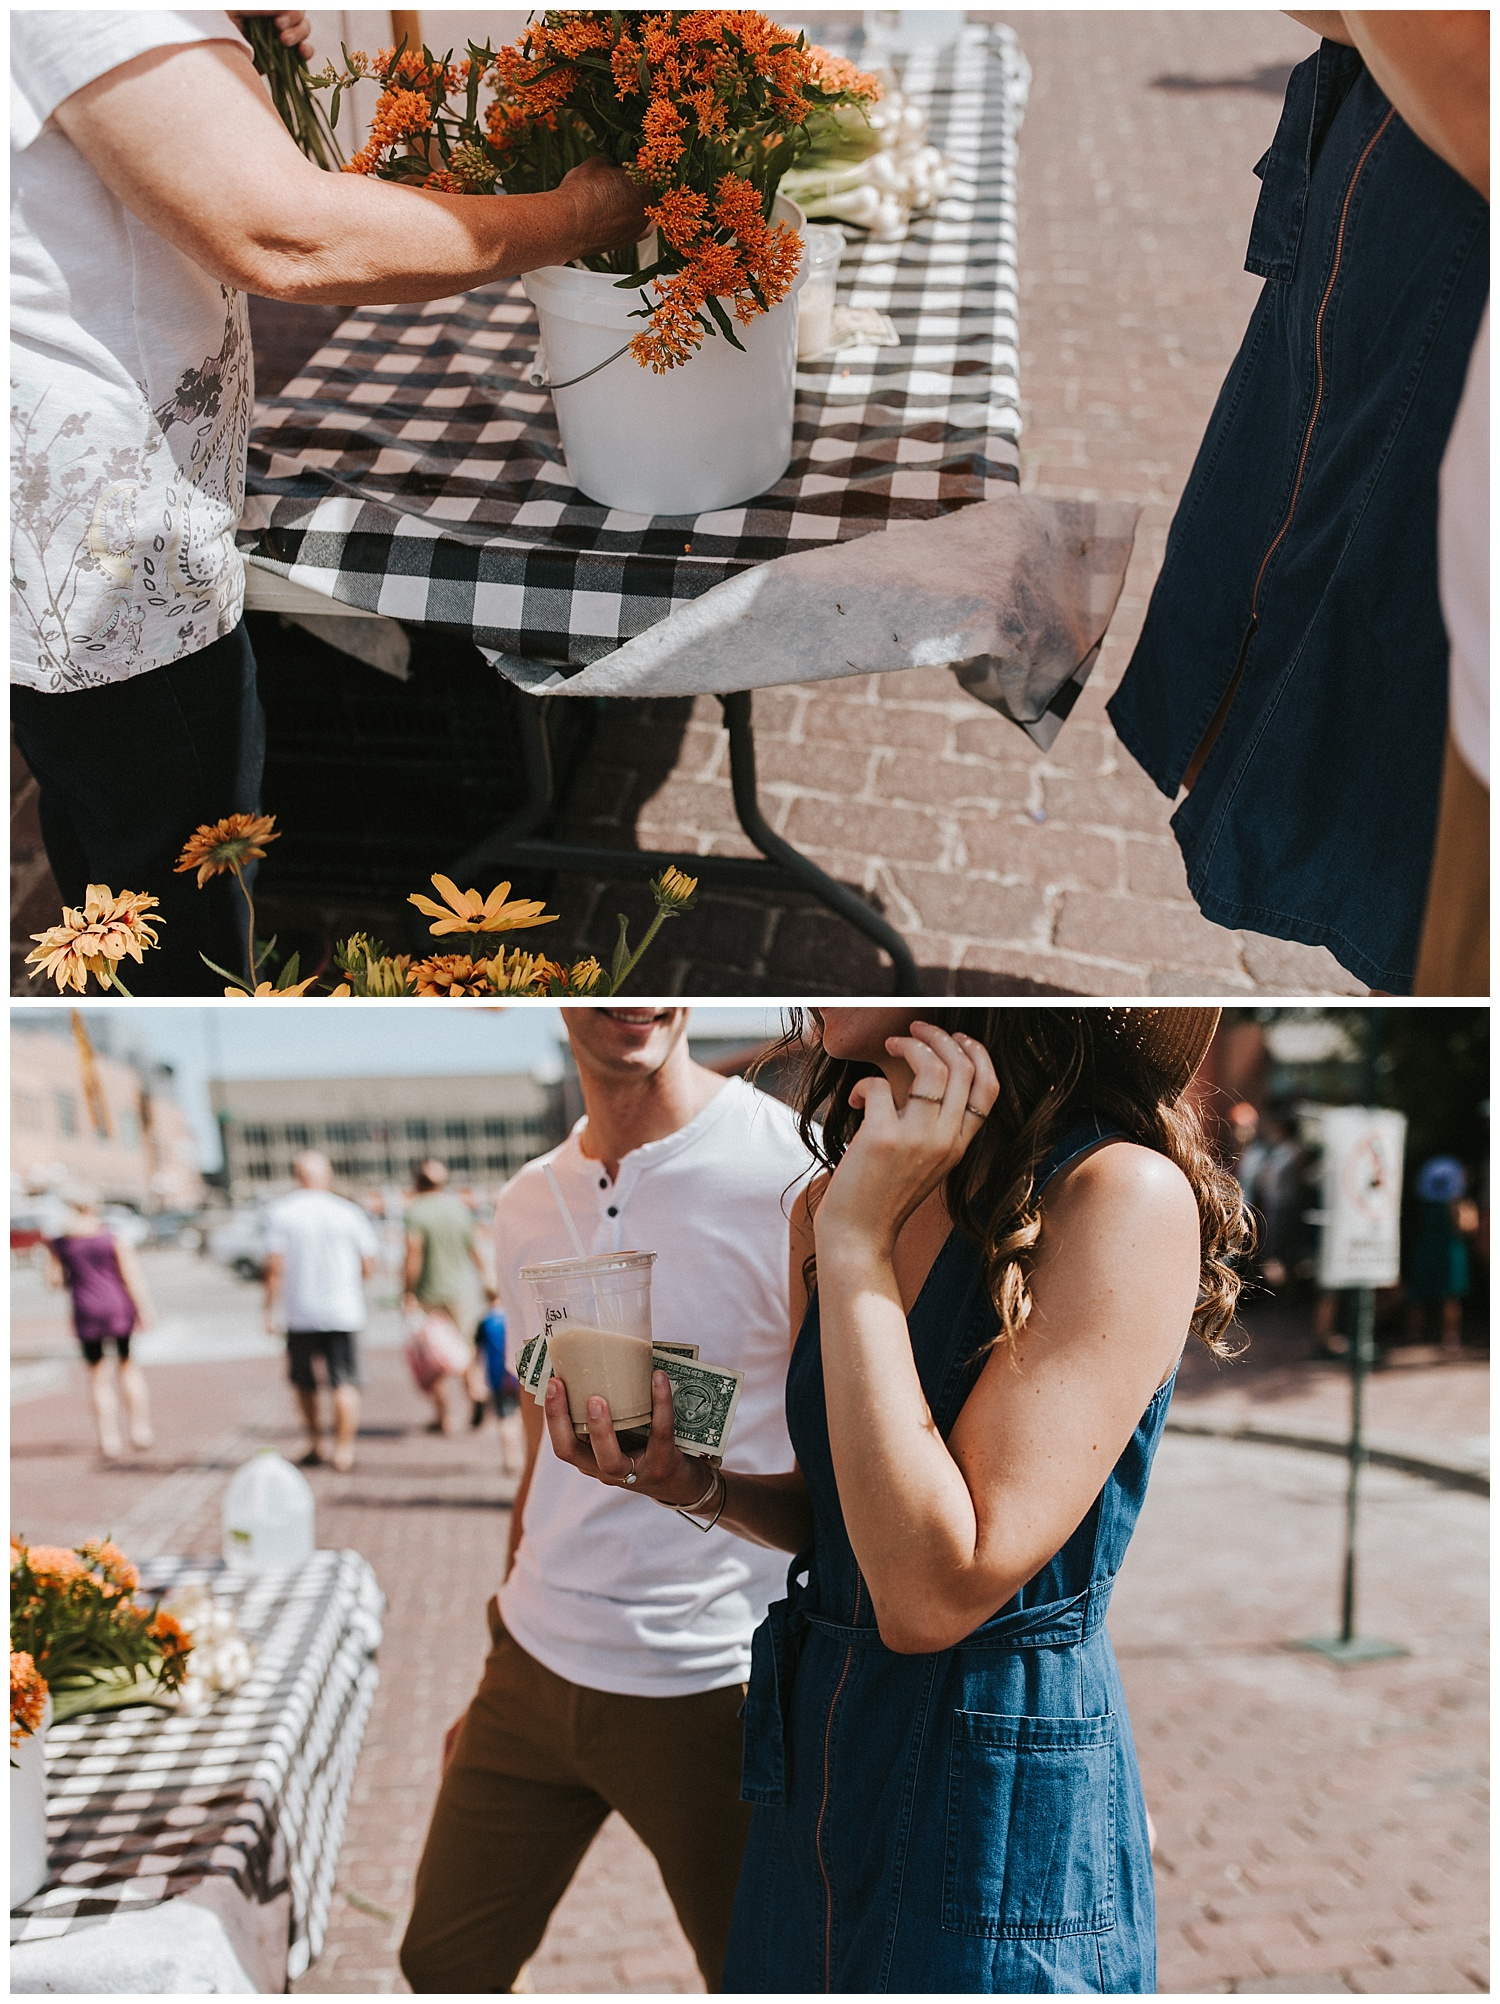 adventurous_photographer_farmers_market_engagement_session_love_midwest_travel_destination_photographer_haley_chicoine_0020.jpg